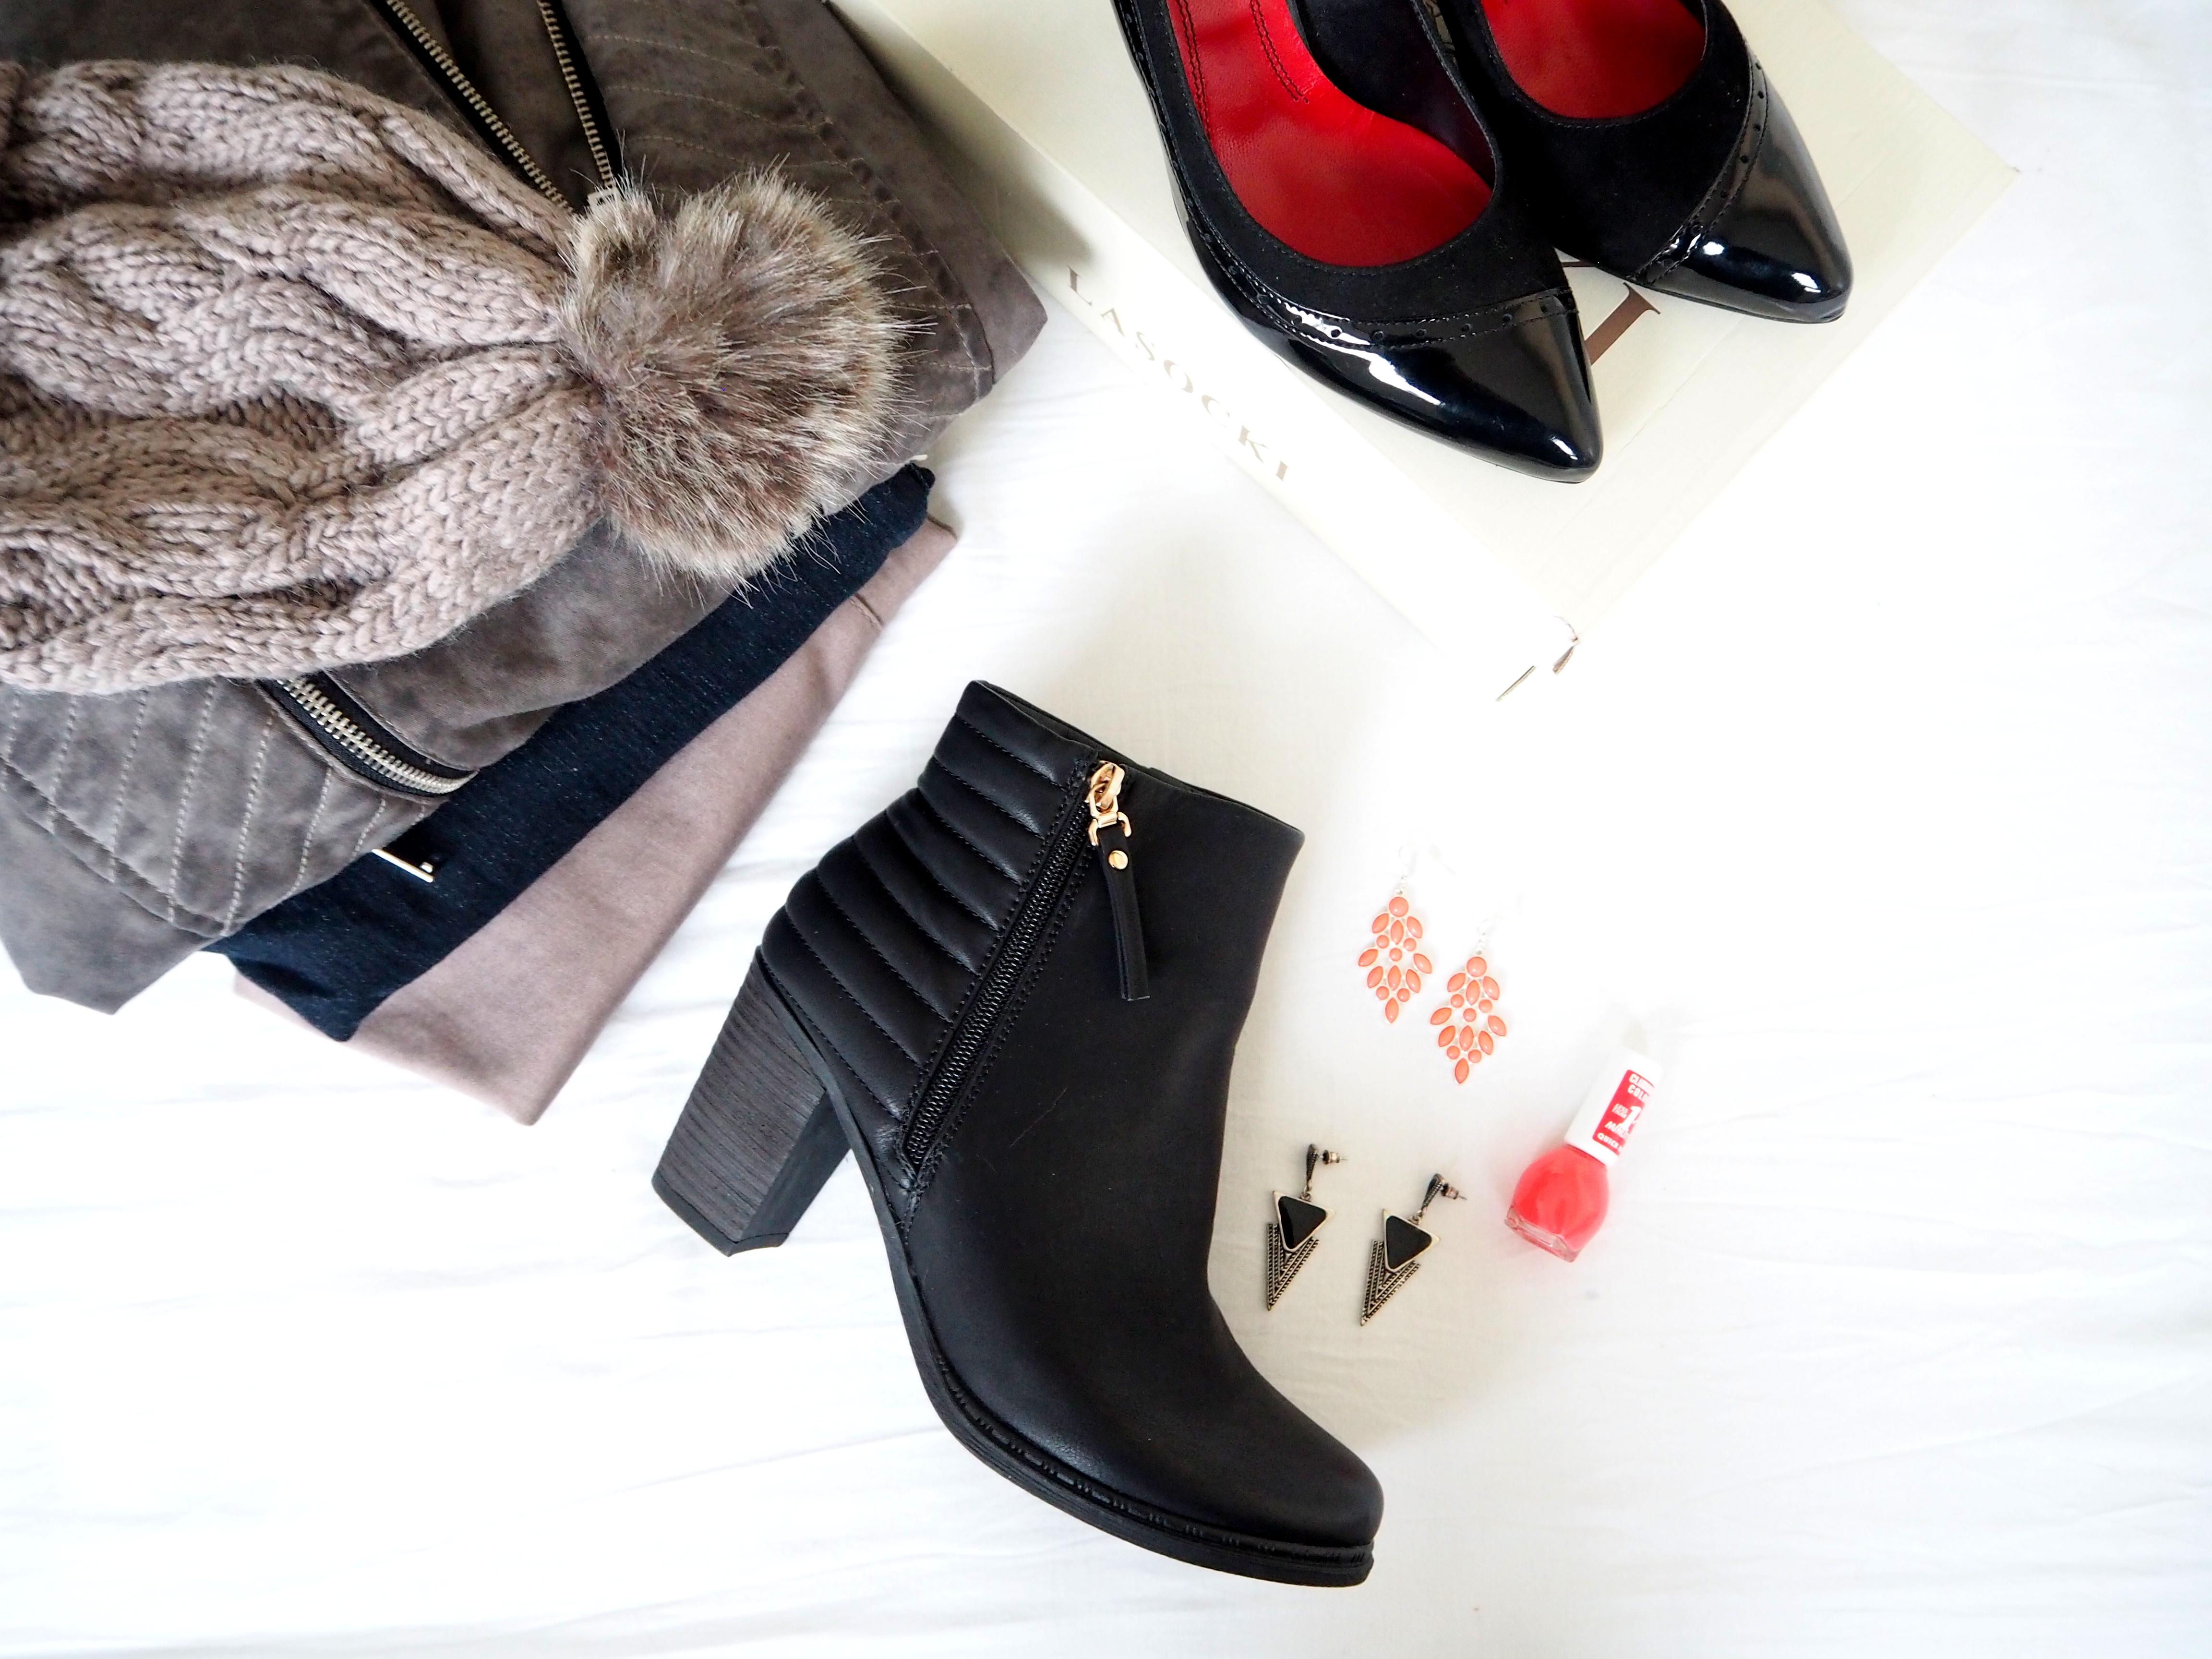 Shoplog Kraków (Polen) – Hakken, blazer en accessoires